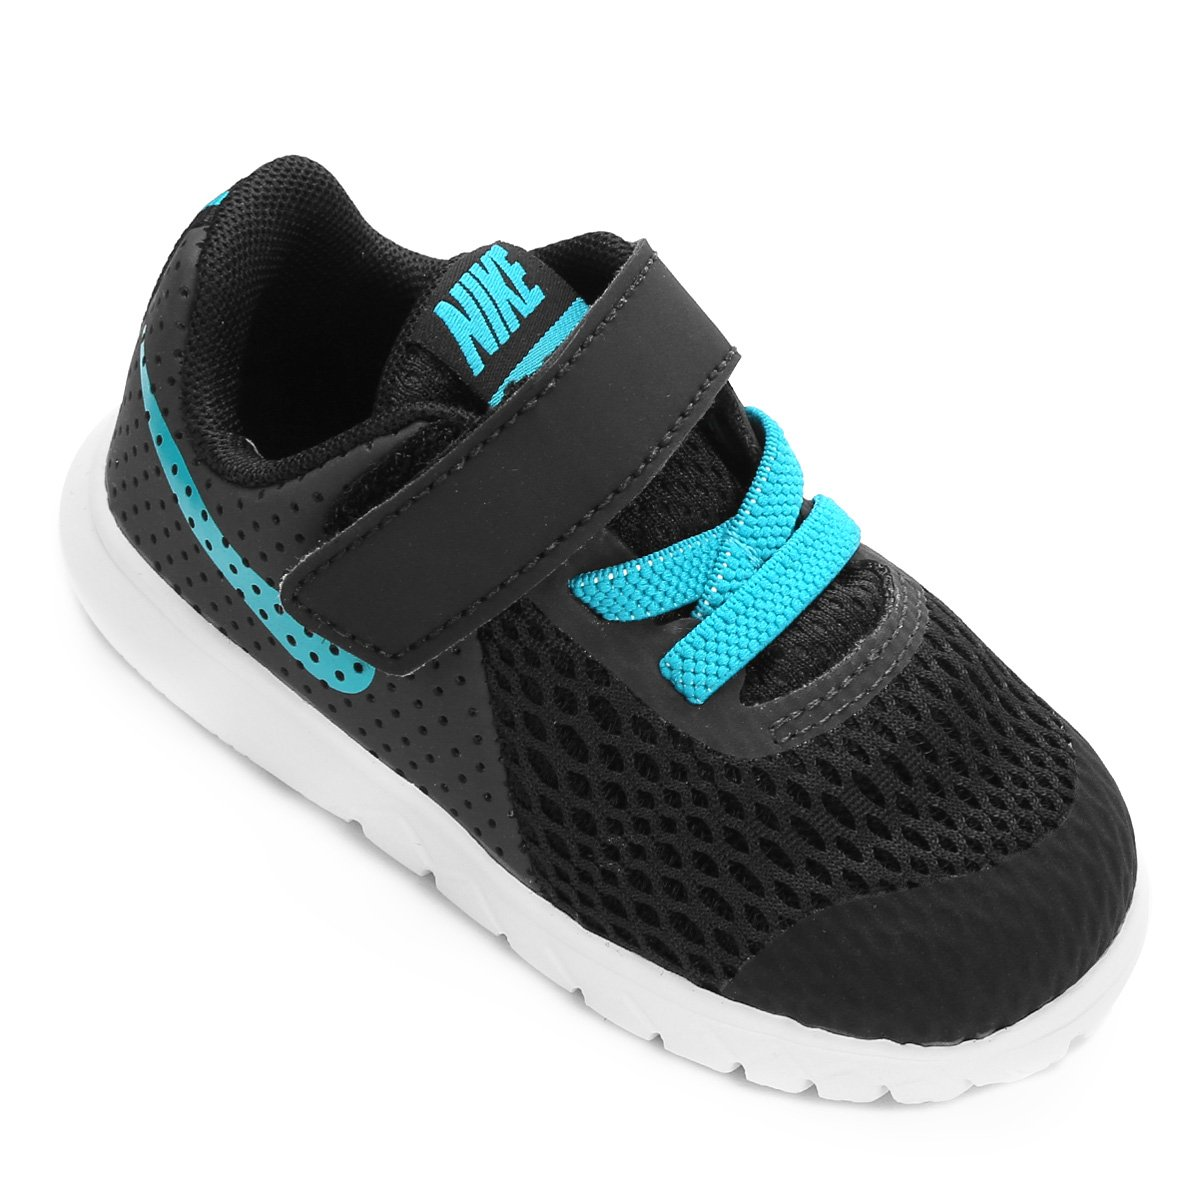 Tênis Infantil Nike Flex Experience 5 - Preto e Azul Turquesa ... 144bfc4d8400b